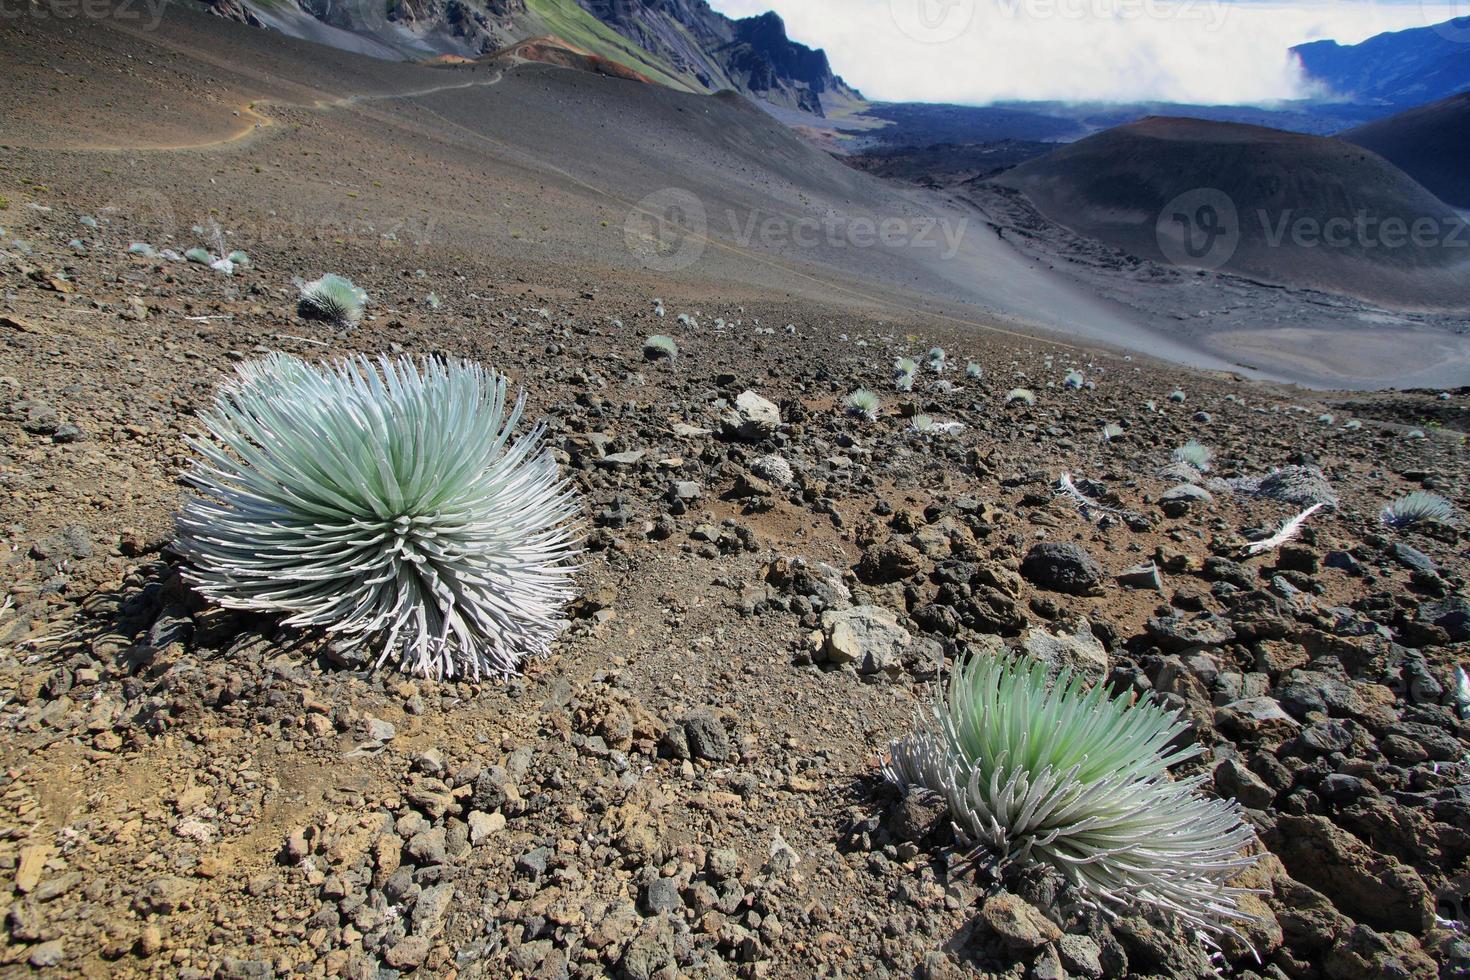 pianta silversword, parco nazionale di haleakala foto